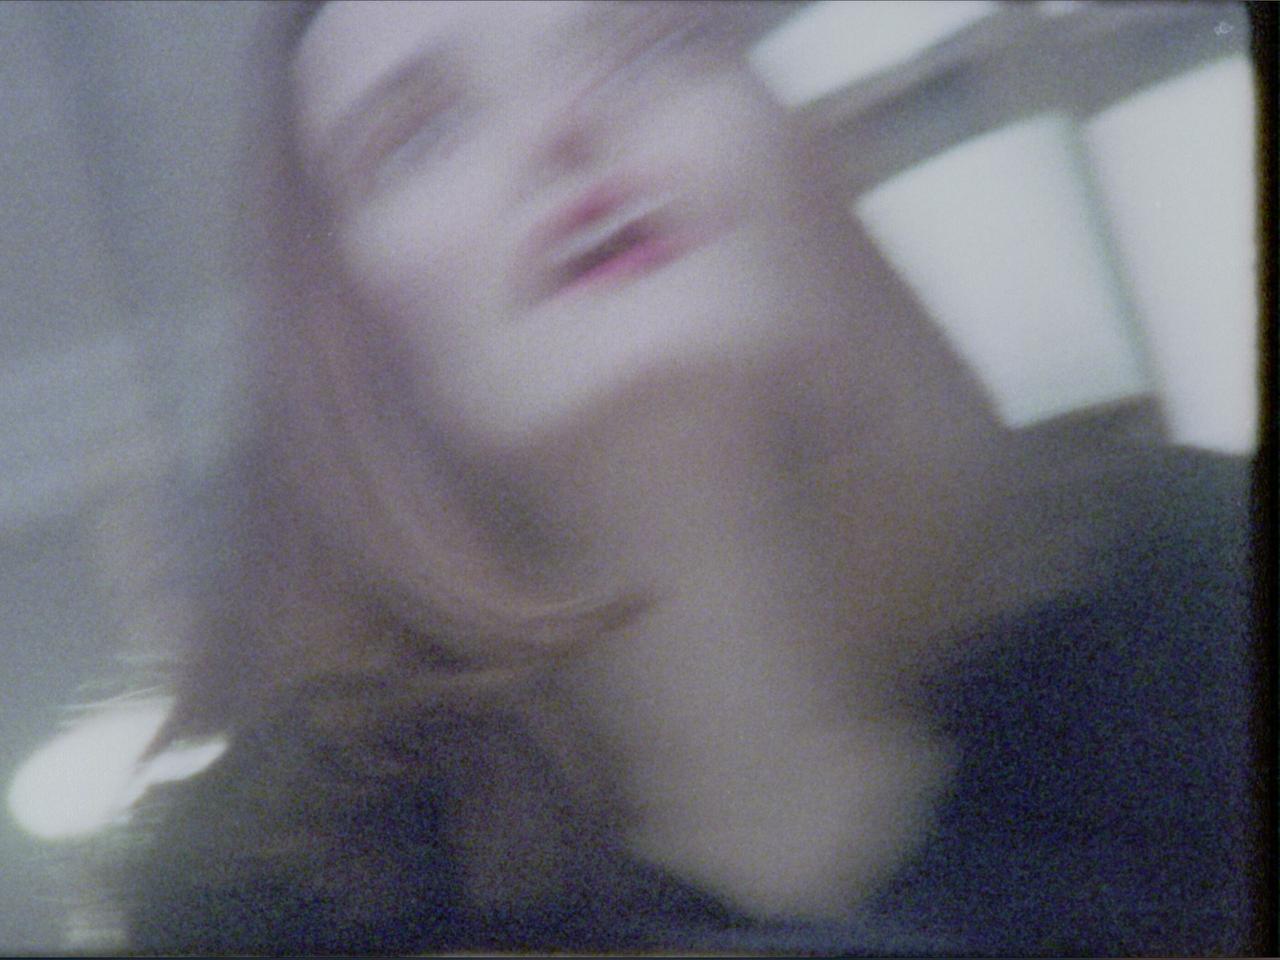 Kodak x Cinelab London Short Film